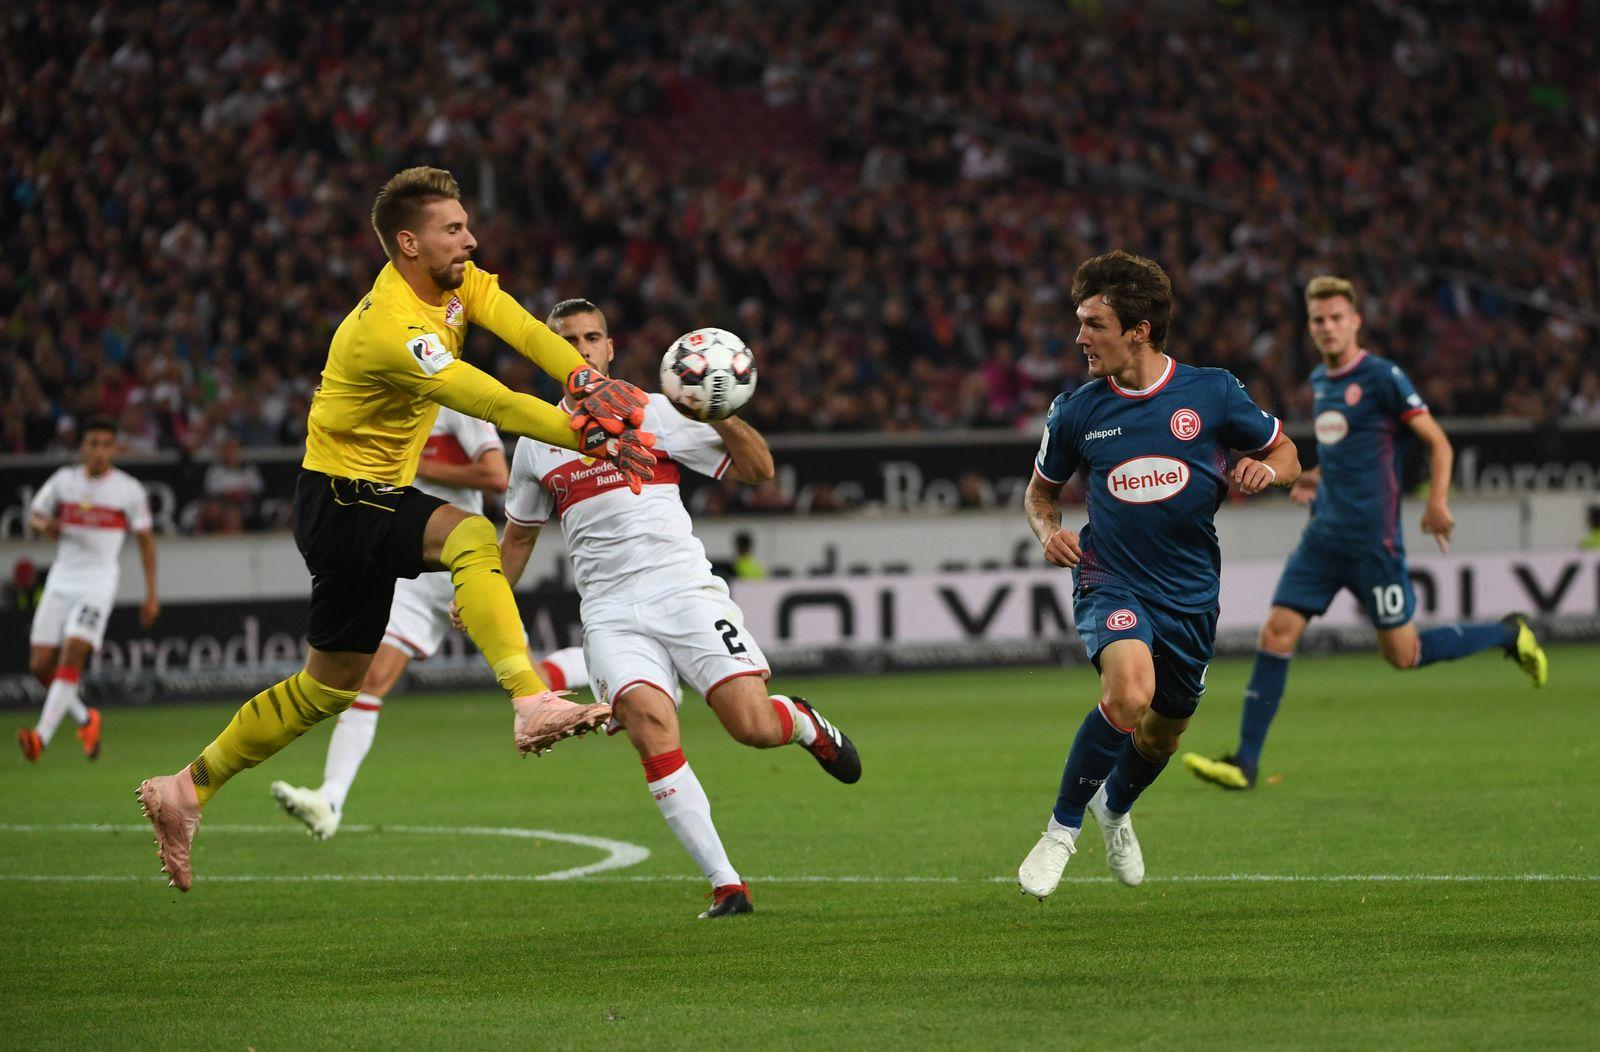 VfB Stuttgart - Fortuna Düsseldorf